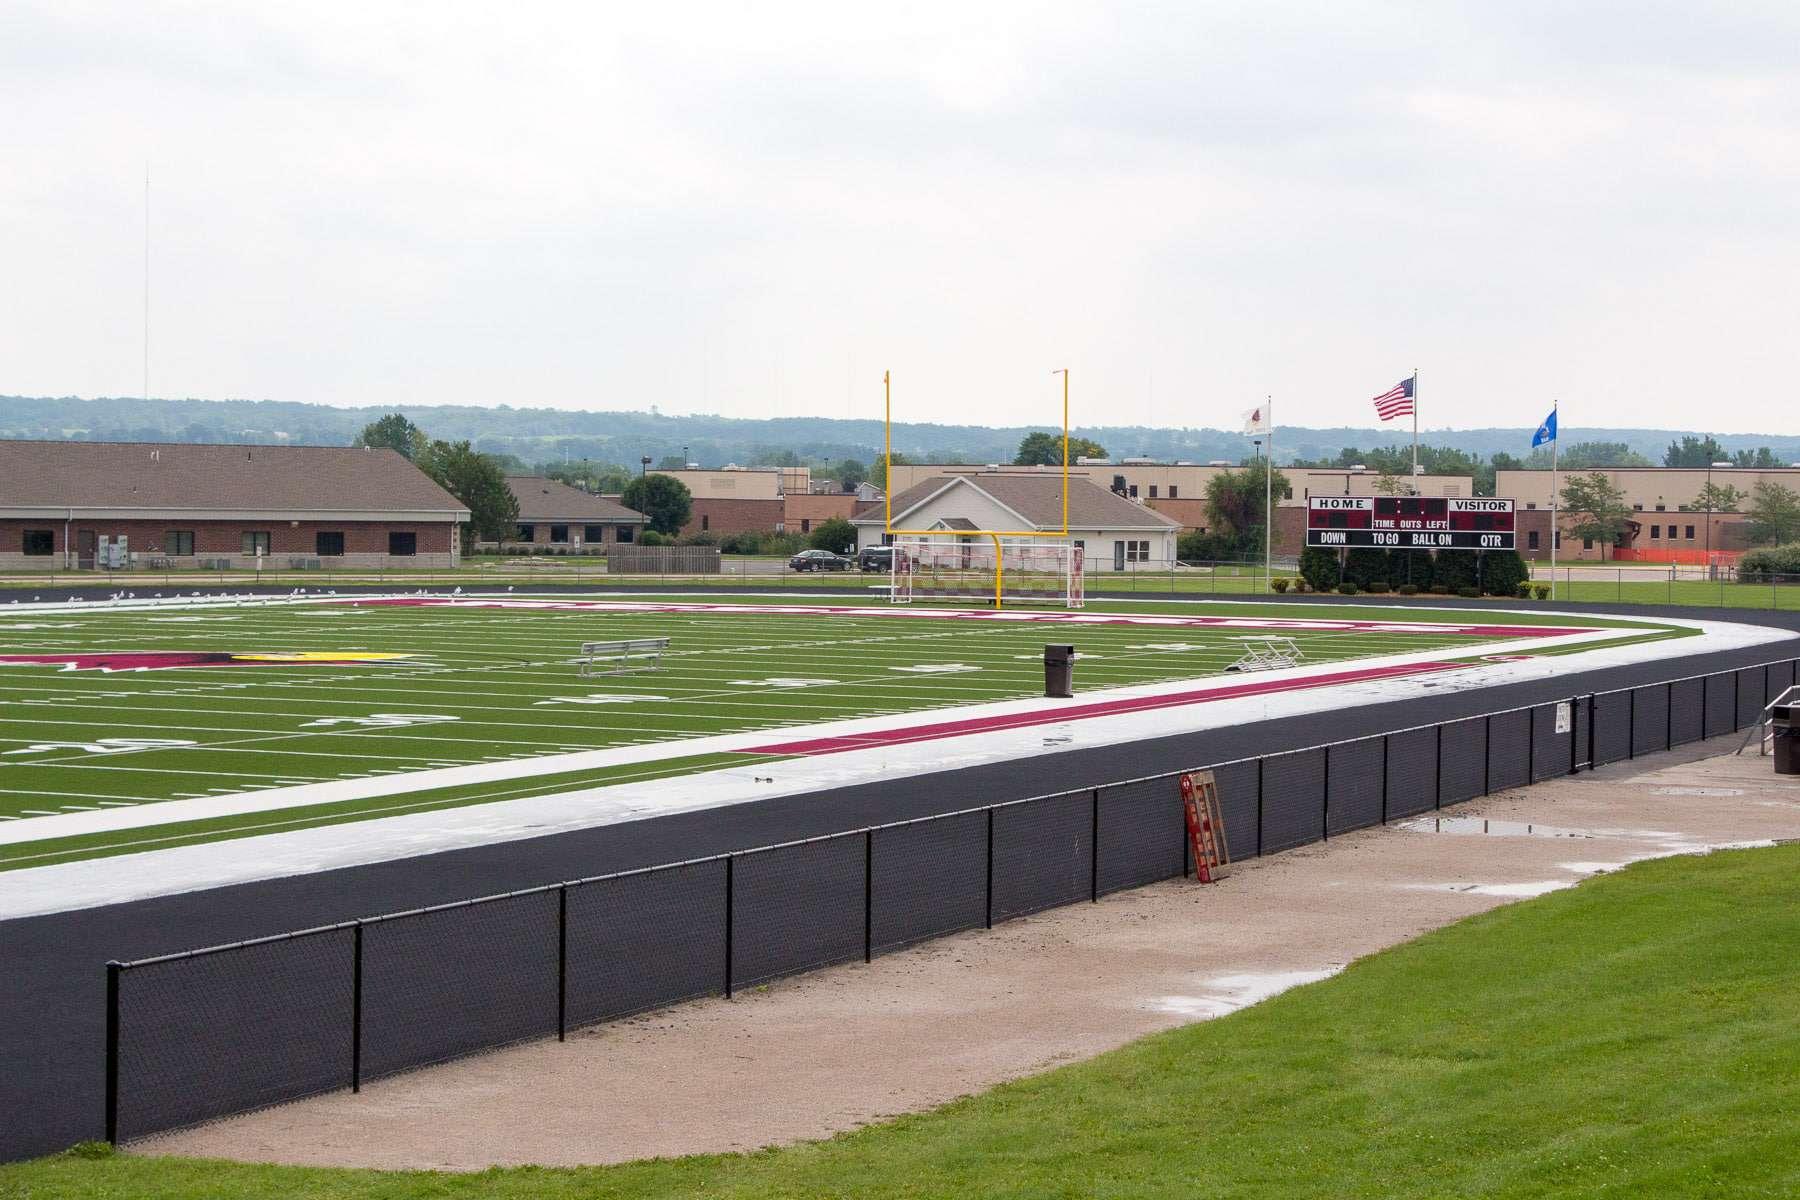 IEI  is a Leader in Athletic Field Renovations in Wisconsin